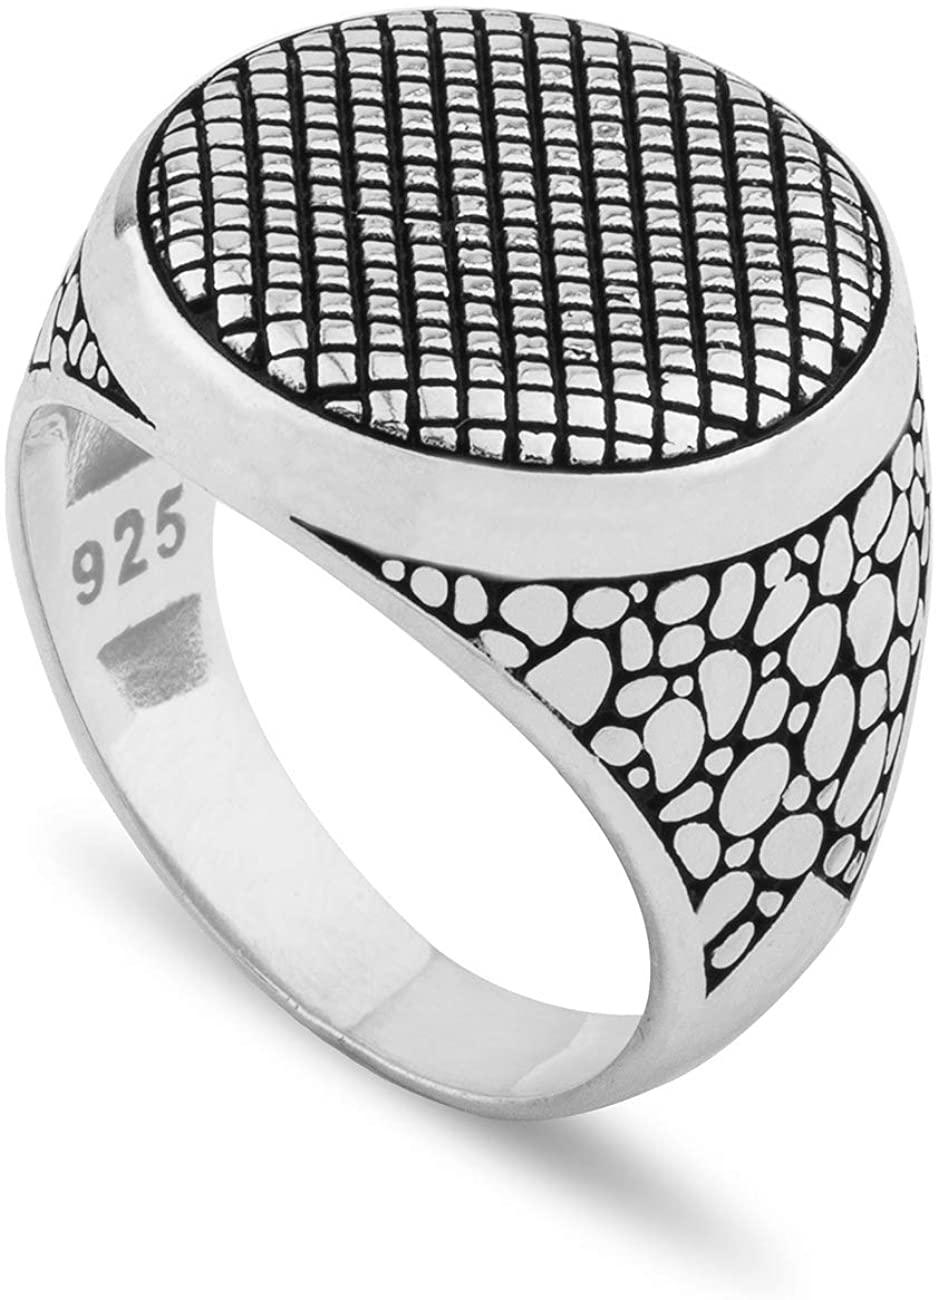 Chicotta Spider Eye Shaped Fine Sterling Silver Ring for Men